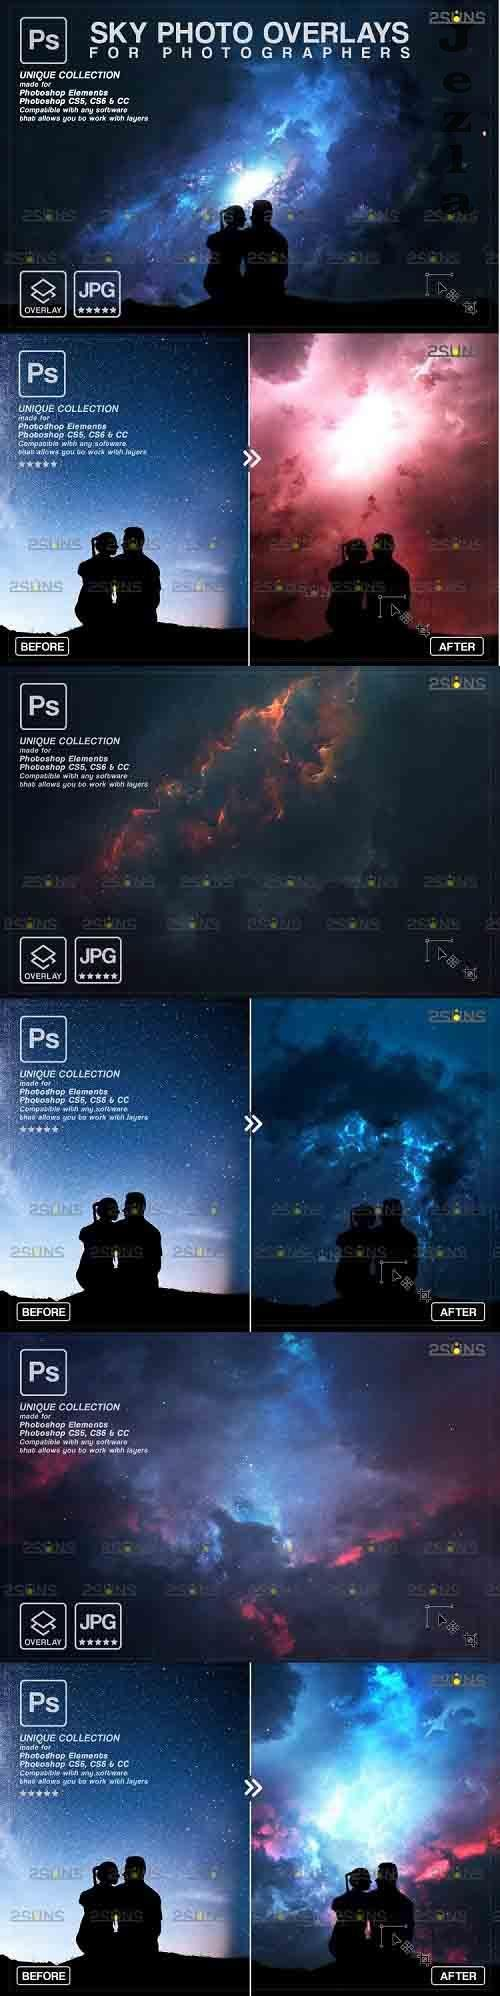 Night Sky Overlays, Pastel sky, sky overlay textures - 1251918